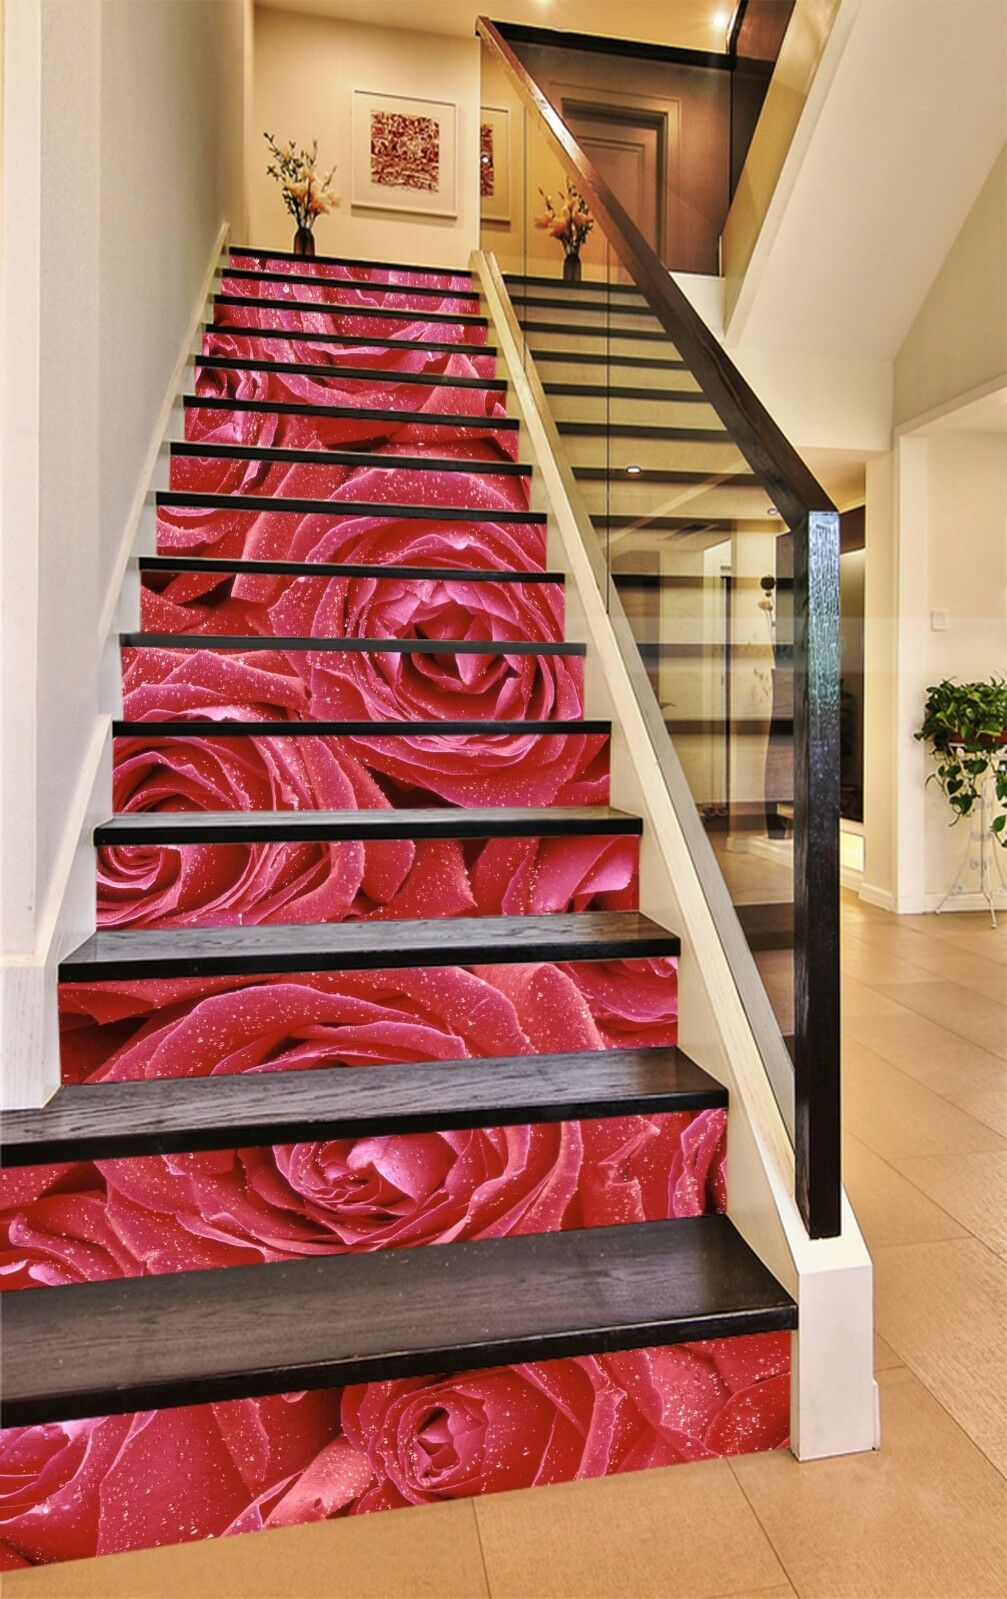 3D rot Petals 23 Stair Risers Decoration Photo Mural Vinyl Decal WandPapier US